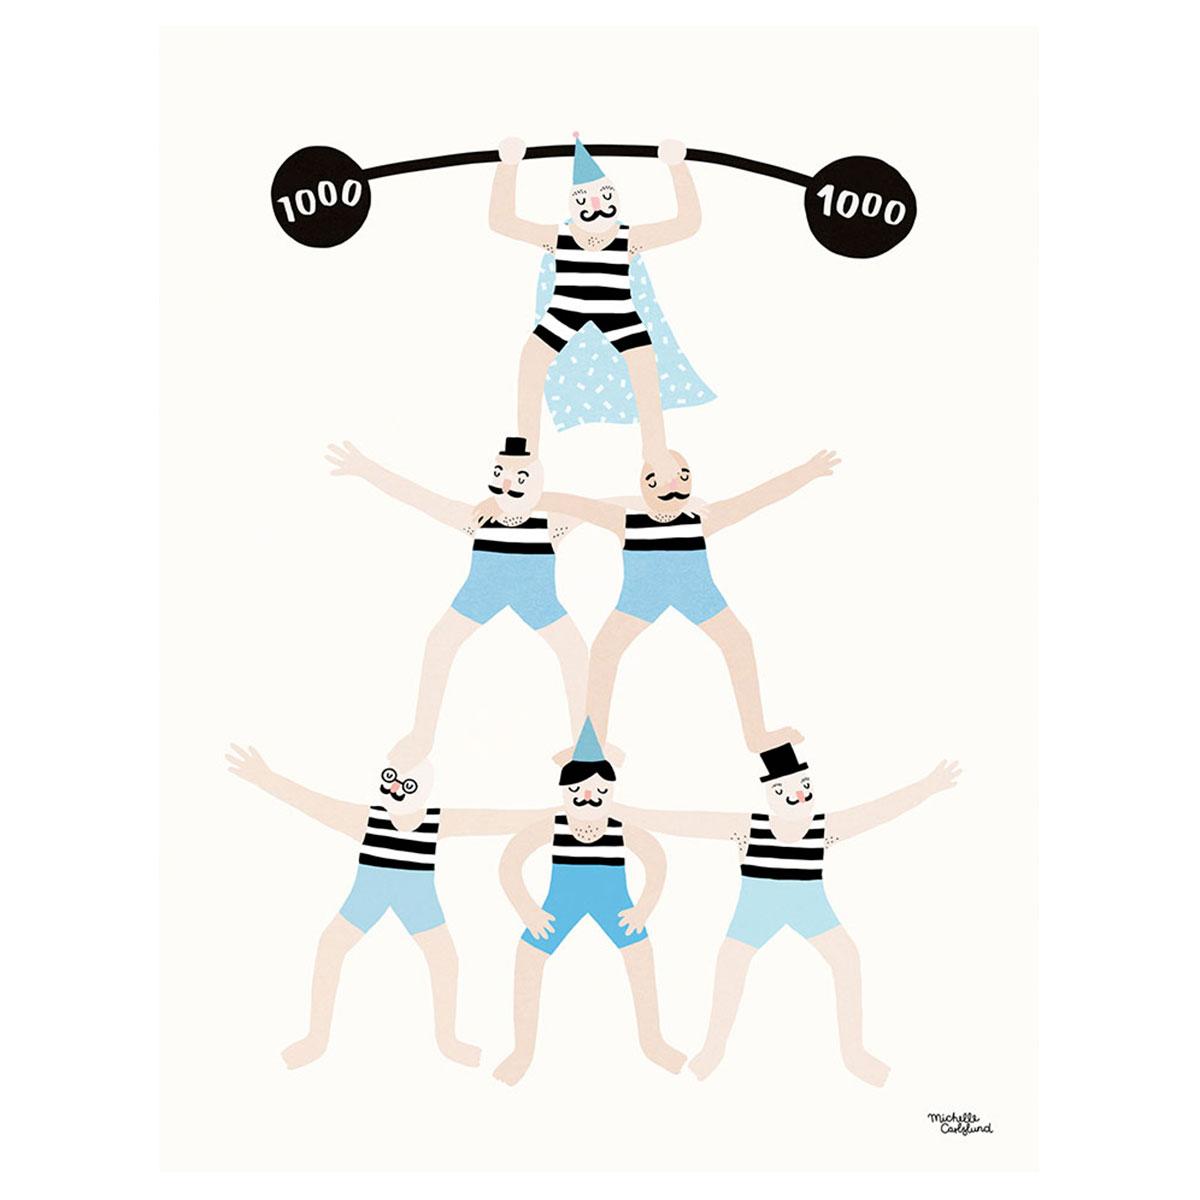 Image of   Plakat - Acrobats af Michelle Carlslund